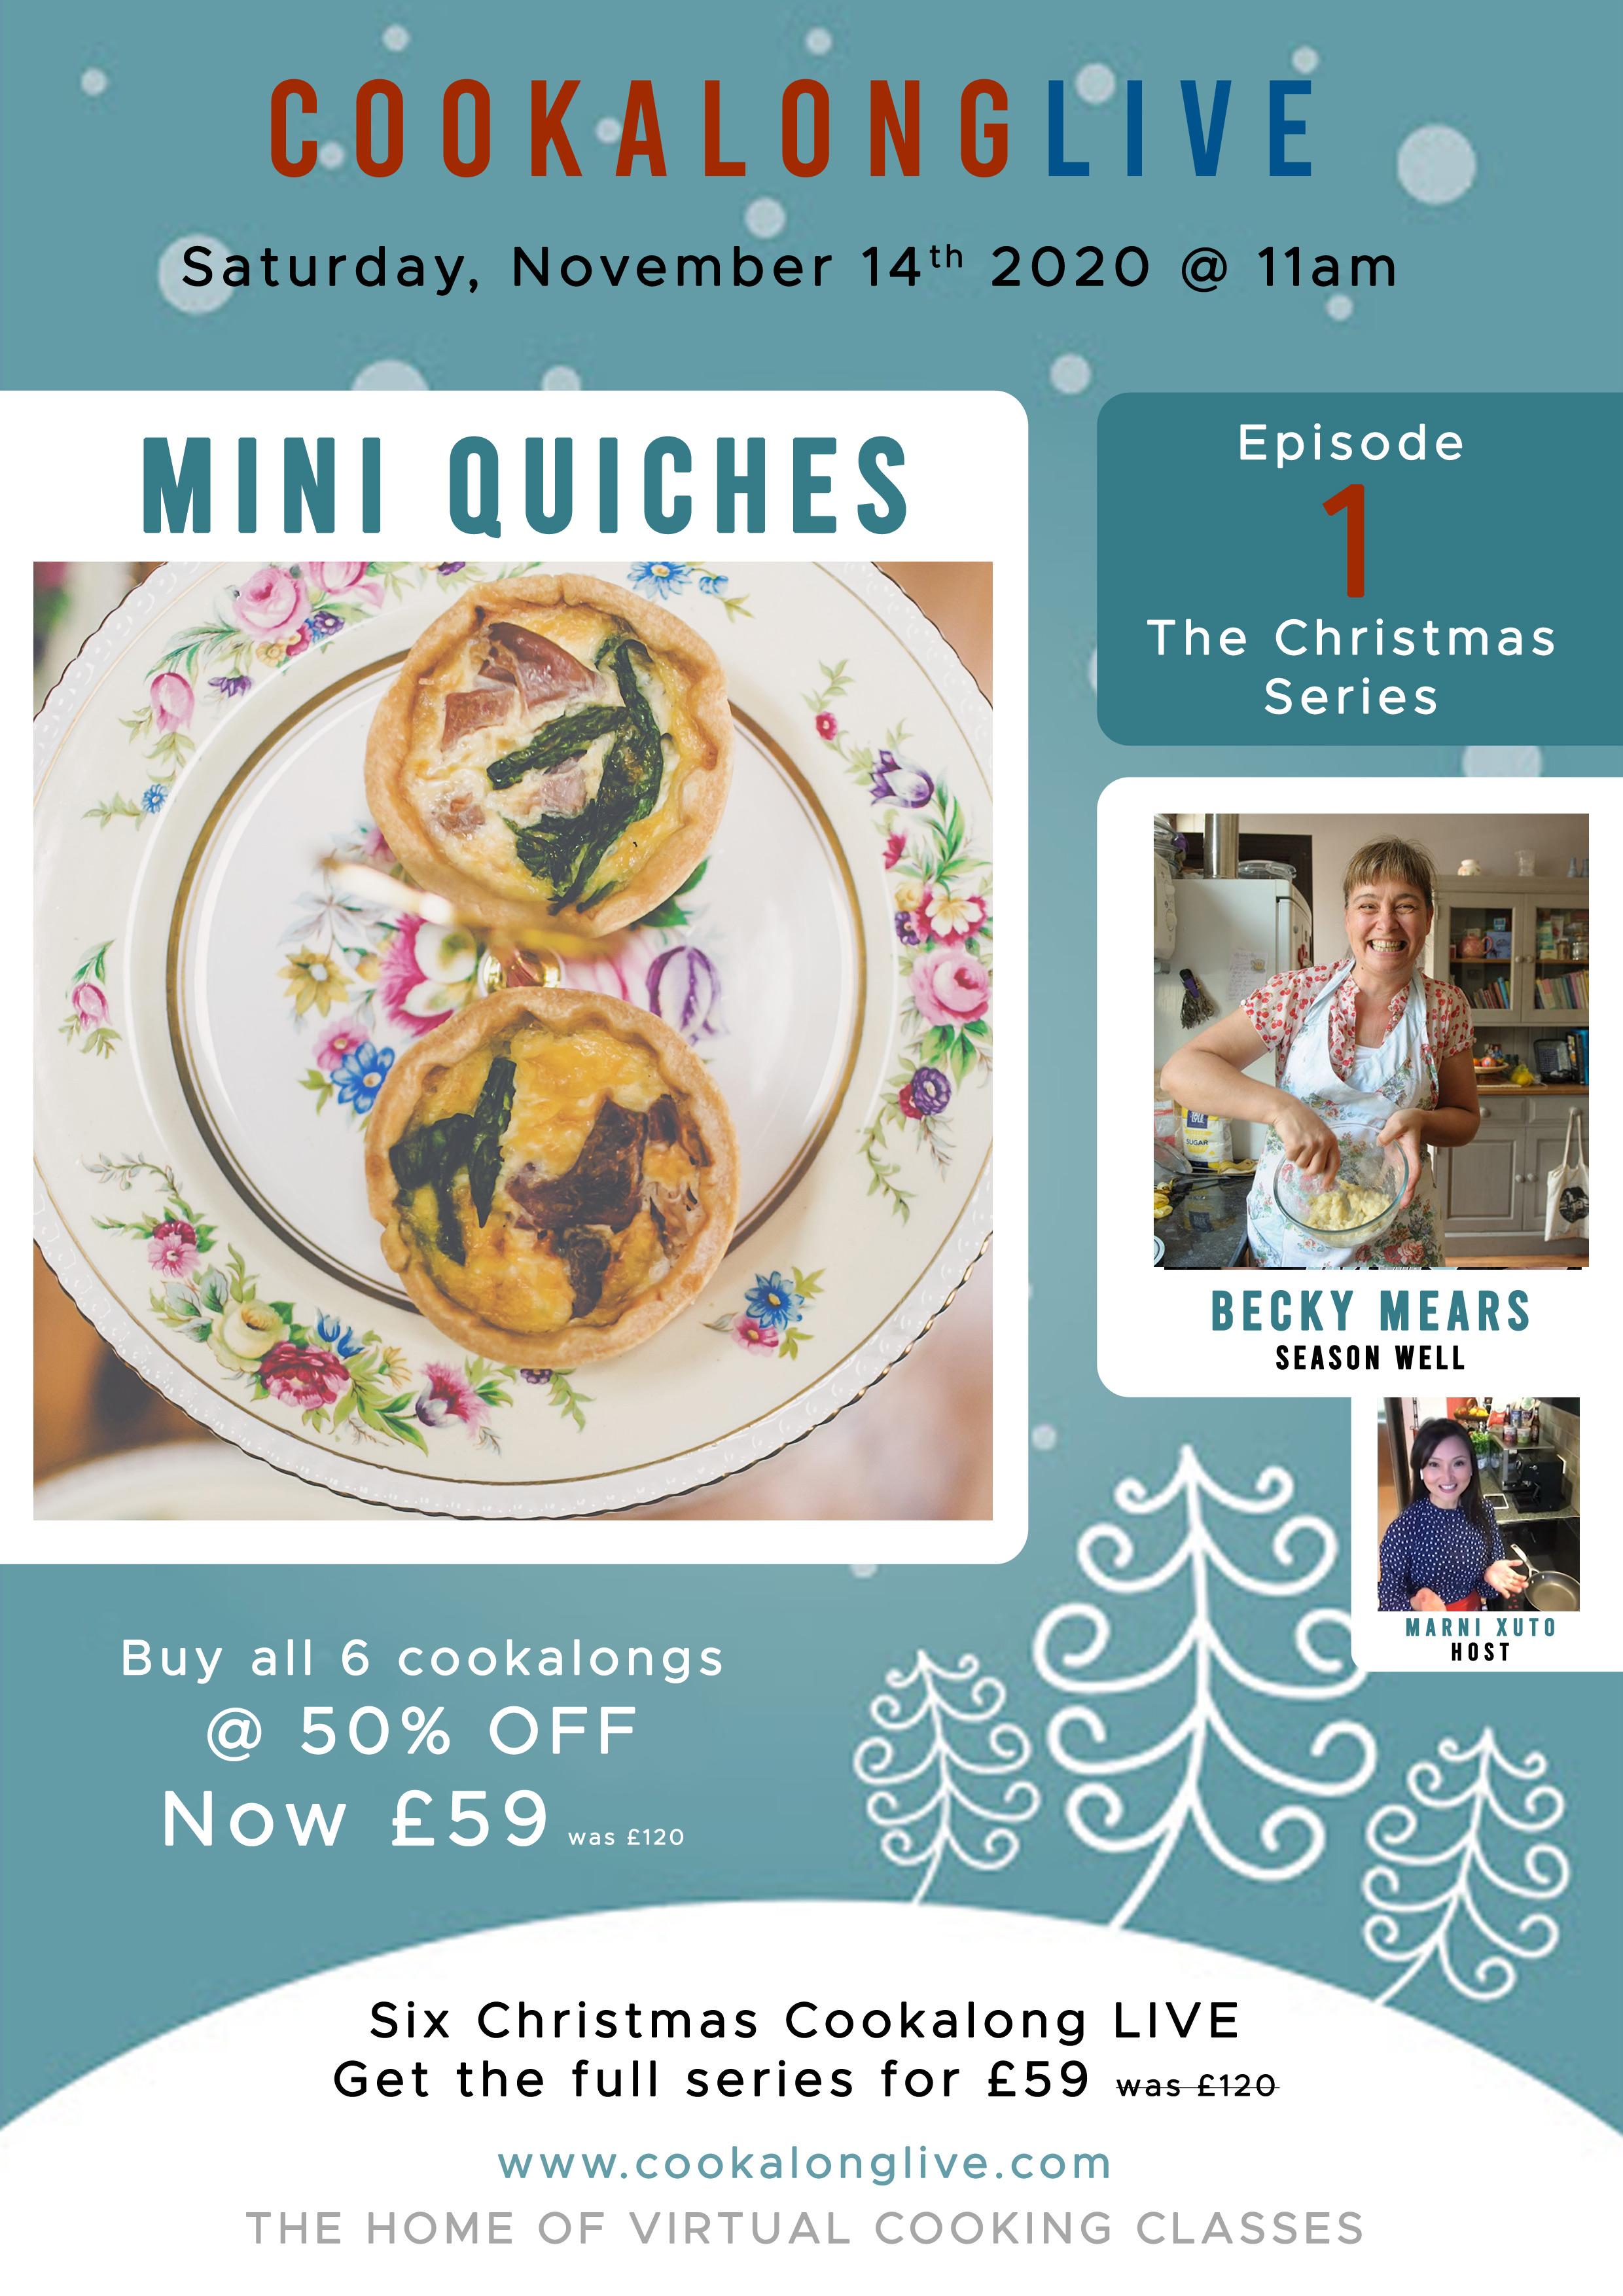 Seasonal Mini Quiches